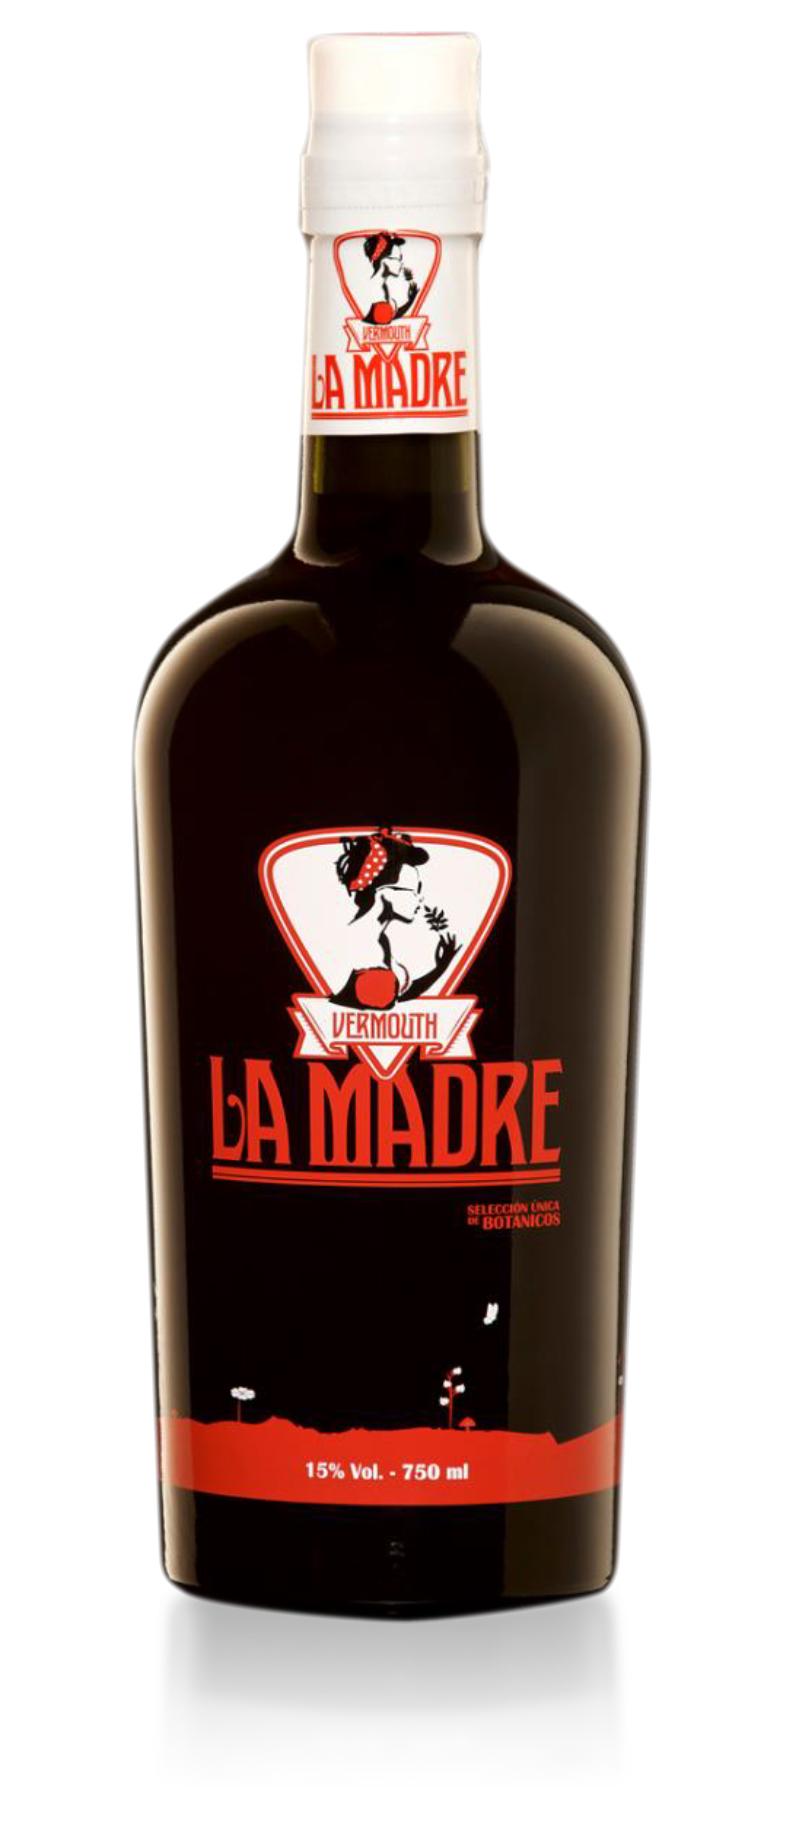 LA-MADRE-red1.jpg